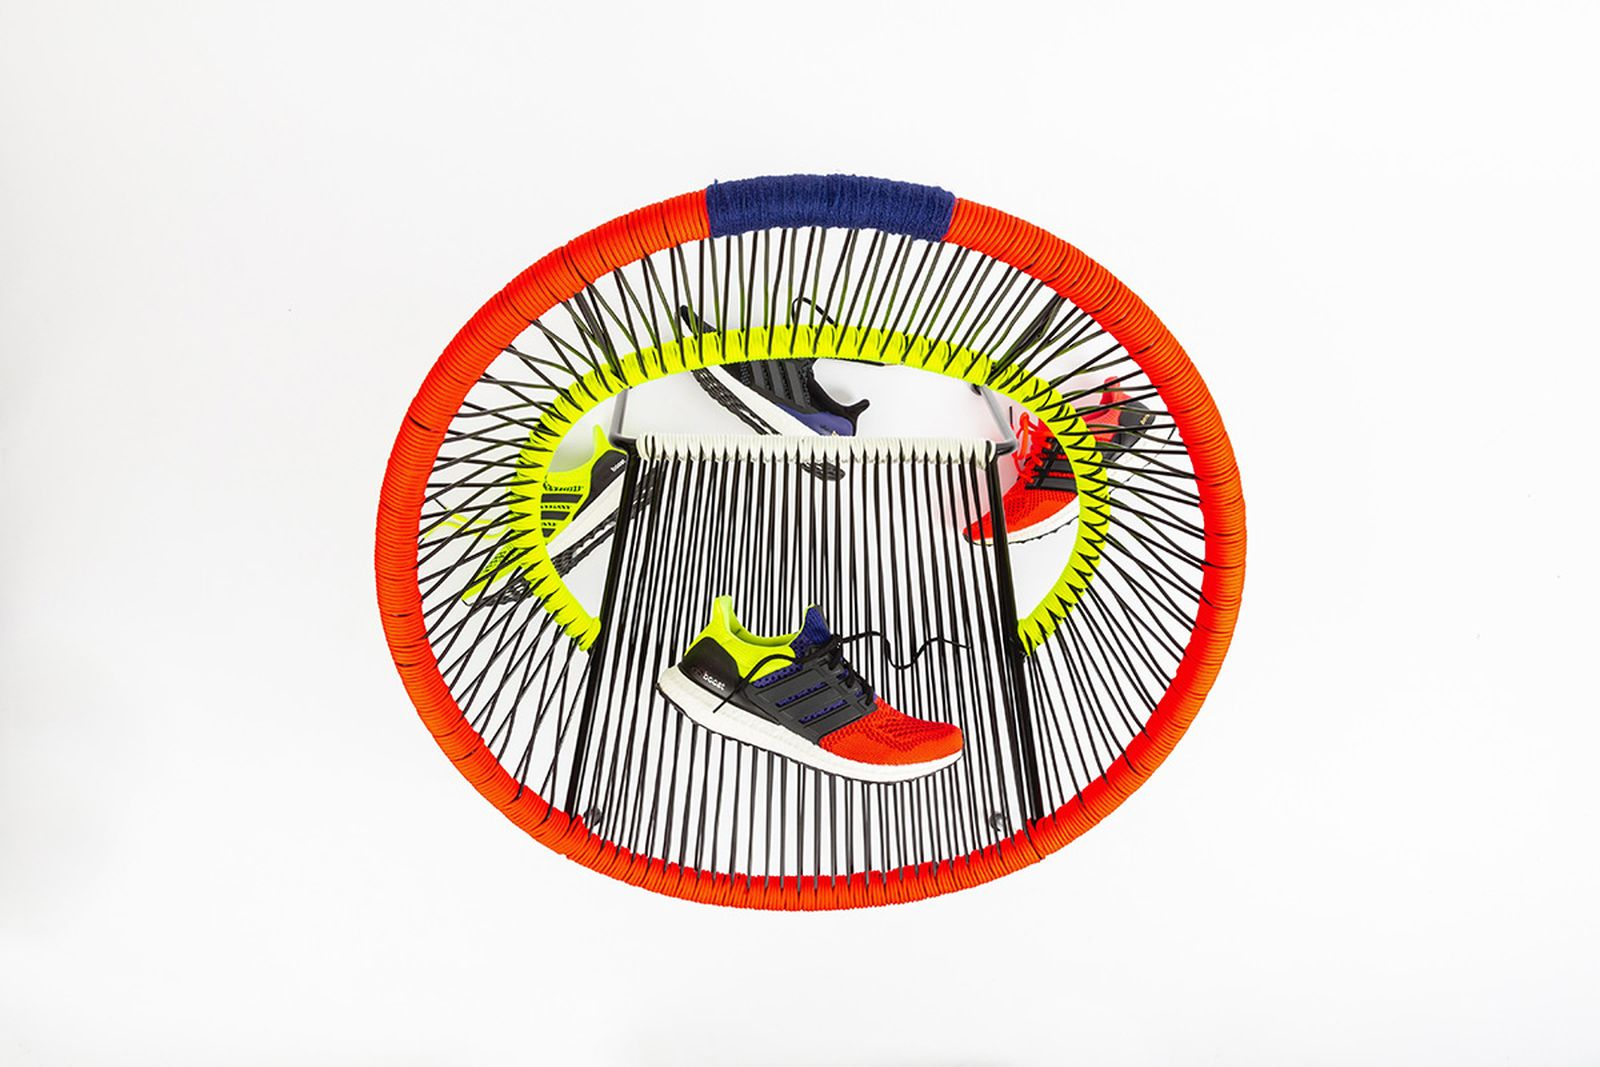 packer adidas ultraboost release date price